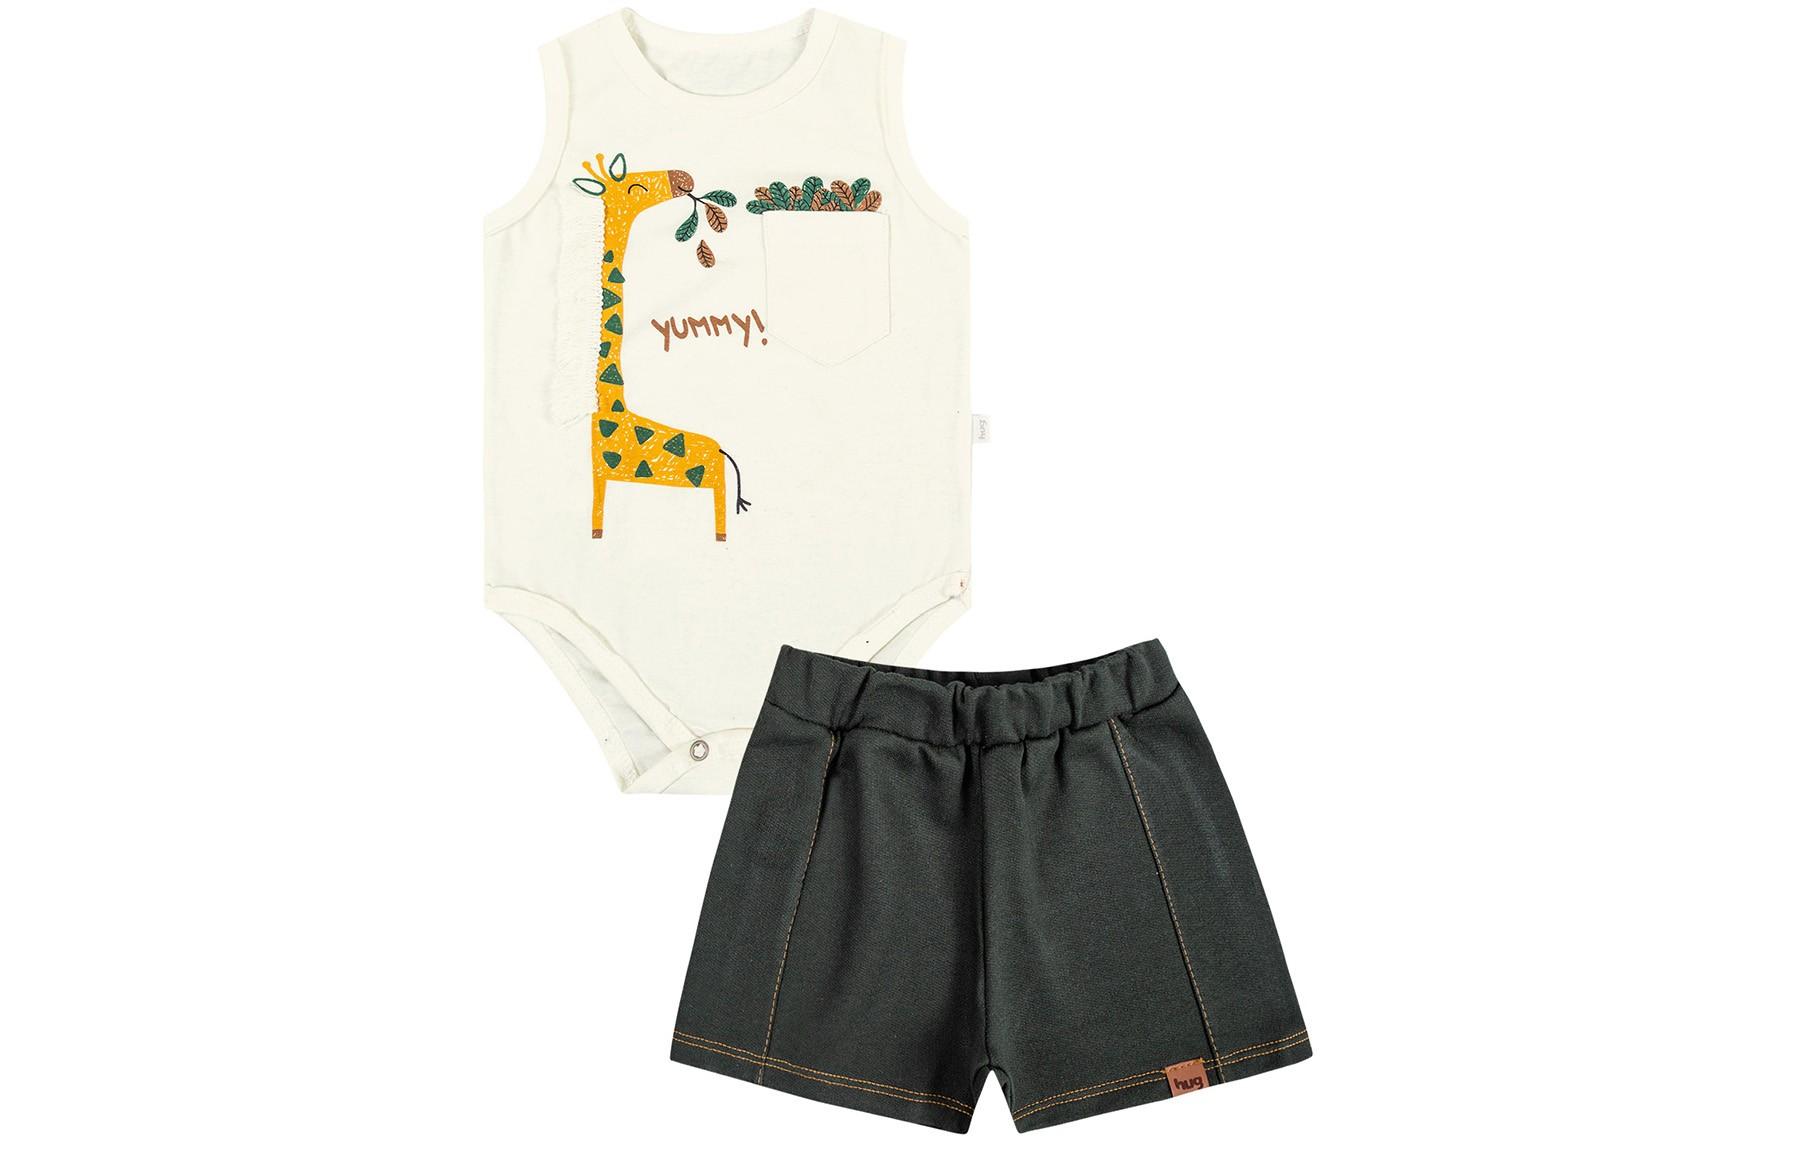 Conjunto Body Regata + Shorts Masculino - Bege